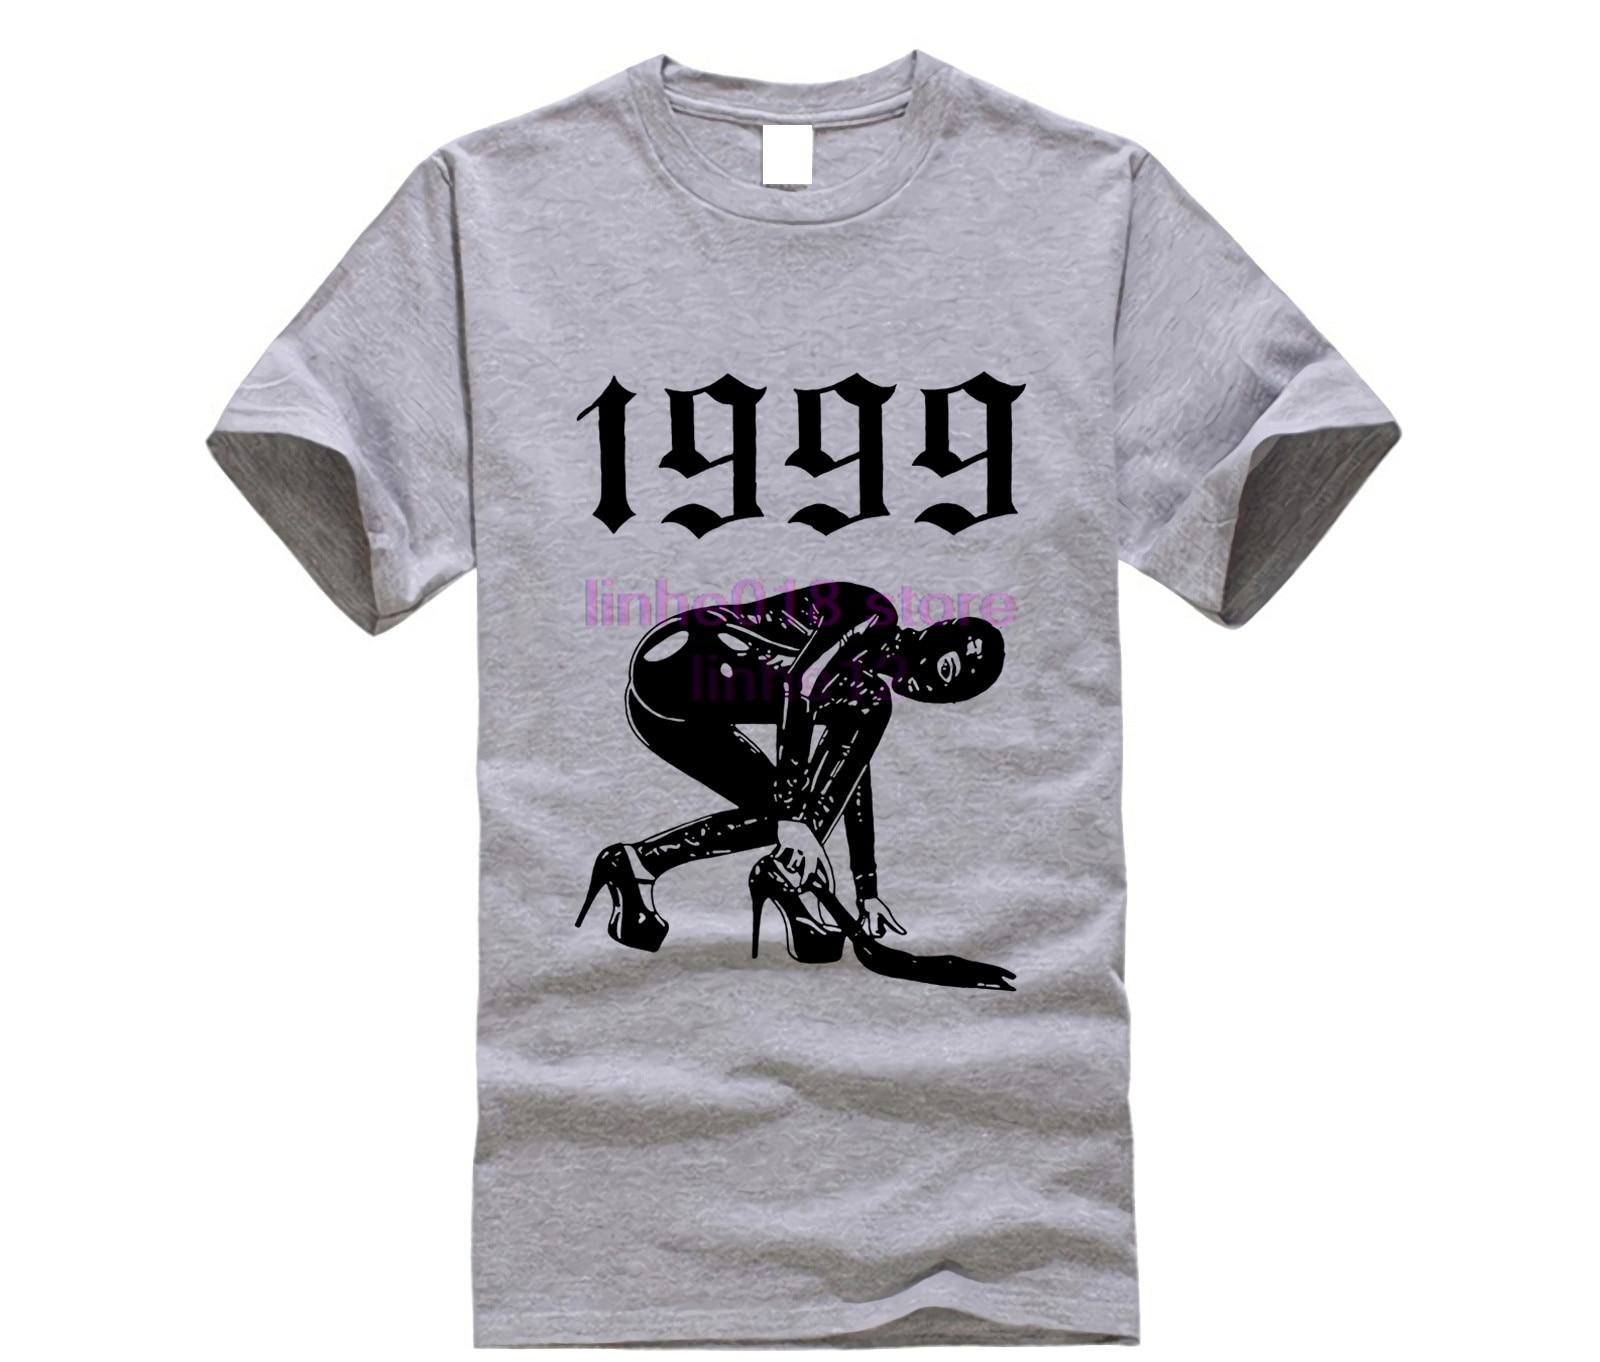 Lordrock homens 1999 t camisa manga curta do vintage lendas nascem em 1999 camiseta carta impresso camisa plus size xxxl tshirt